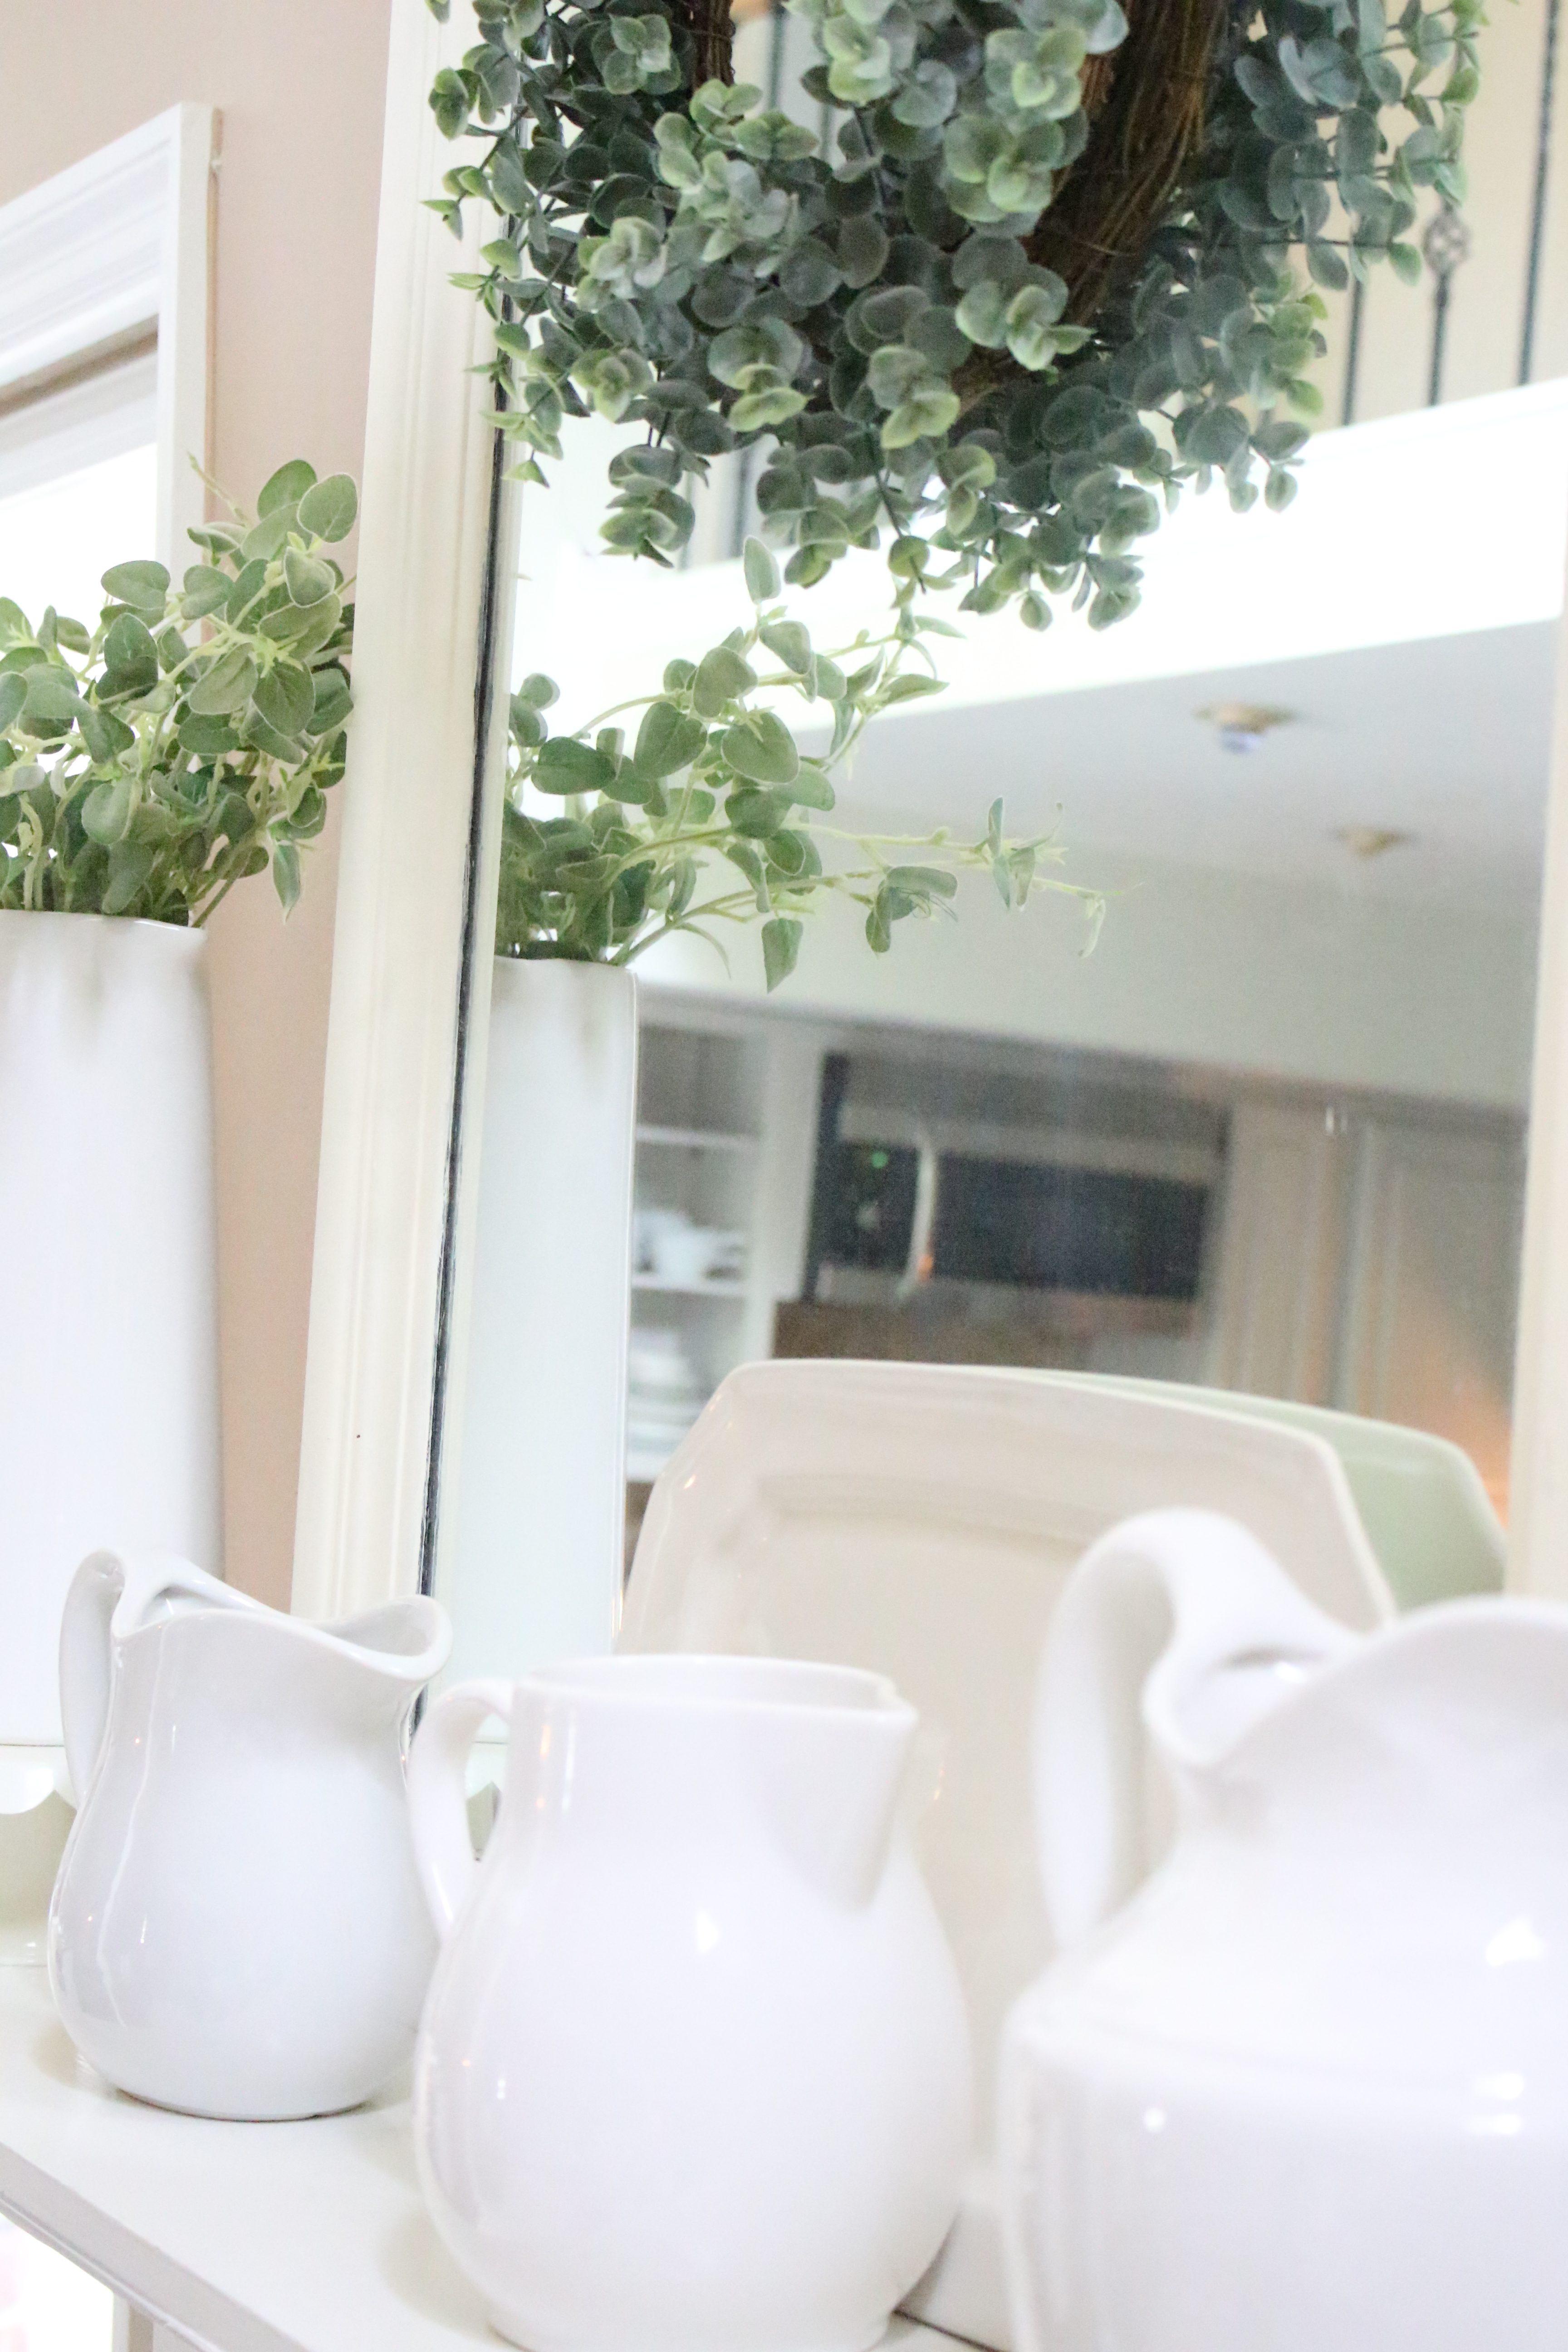 Summer Mantel- Mantle- summer decor- decorating your mantel for summer- fireplace decorating- summer ideas- summer decorating- farmhouse mantel- neutral decor- neutral mantel- chalkboard- white pitchers displayed- mantel displays